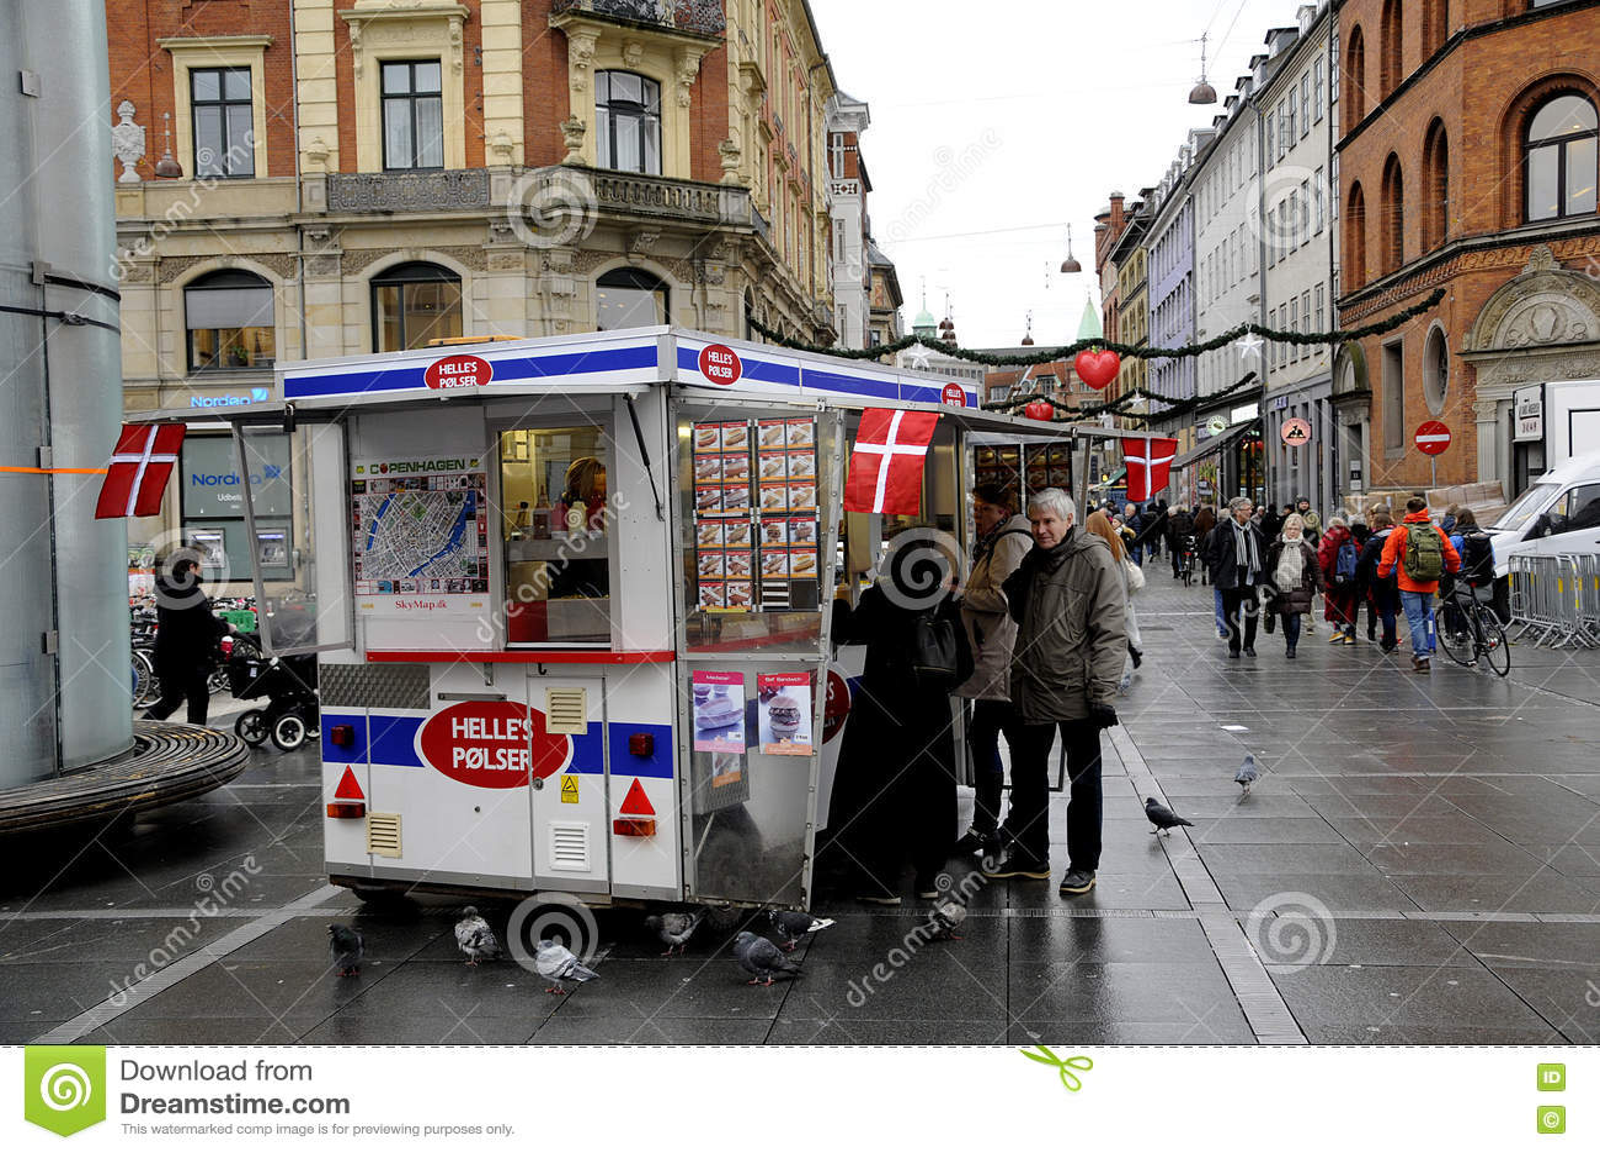 f2dec9e3 Copenhagen / Denmark_ 18th. November 2016 _ Danish famous hot dog van  Helle`s polser norreport trian station. Photo. Francis Joseph  Dean/Deanpictures.